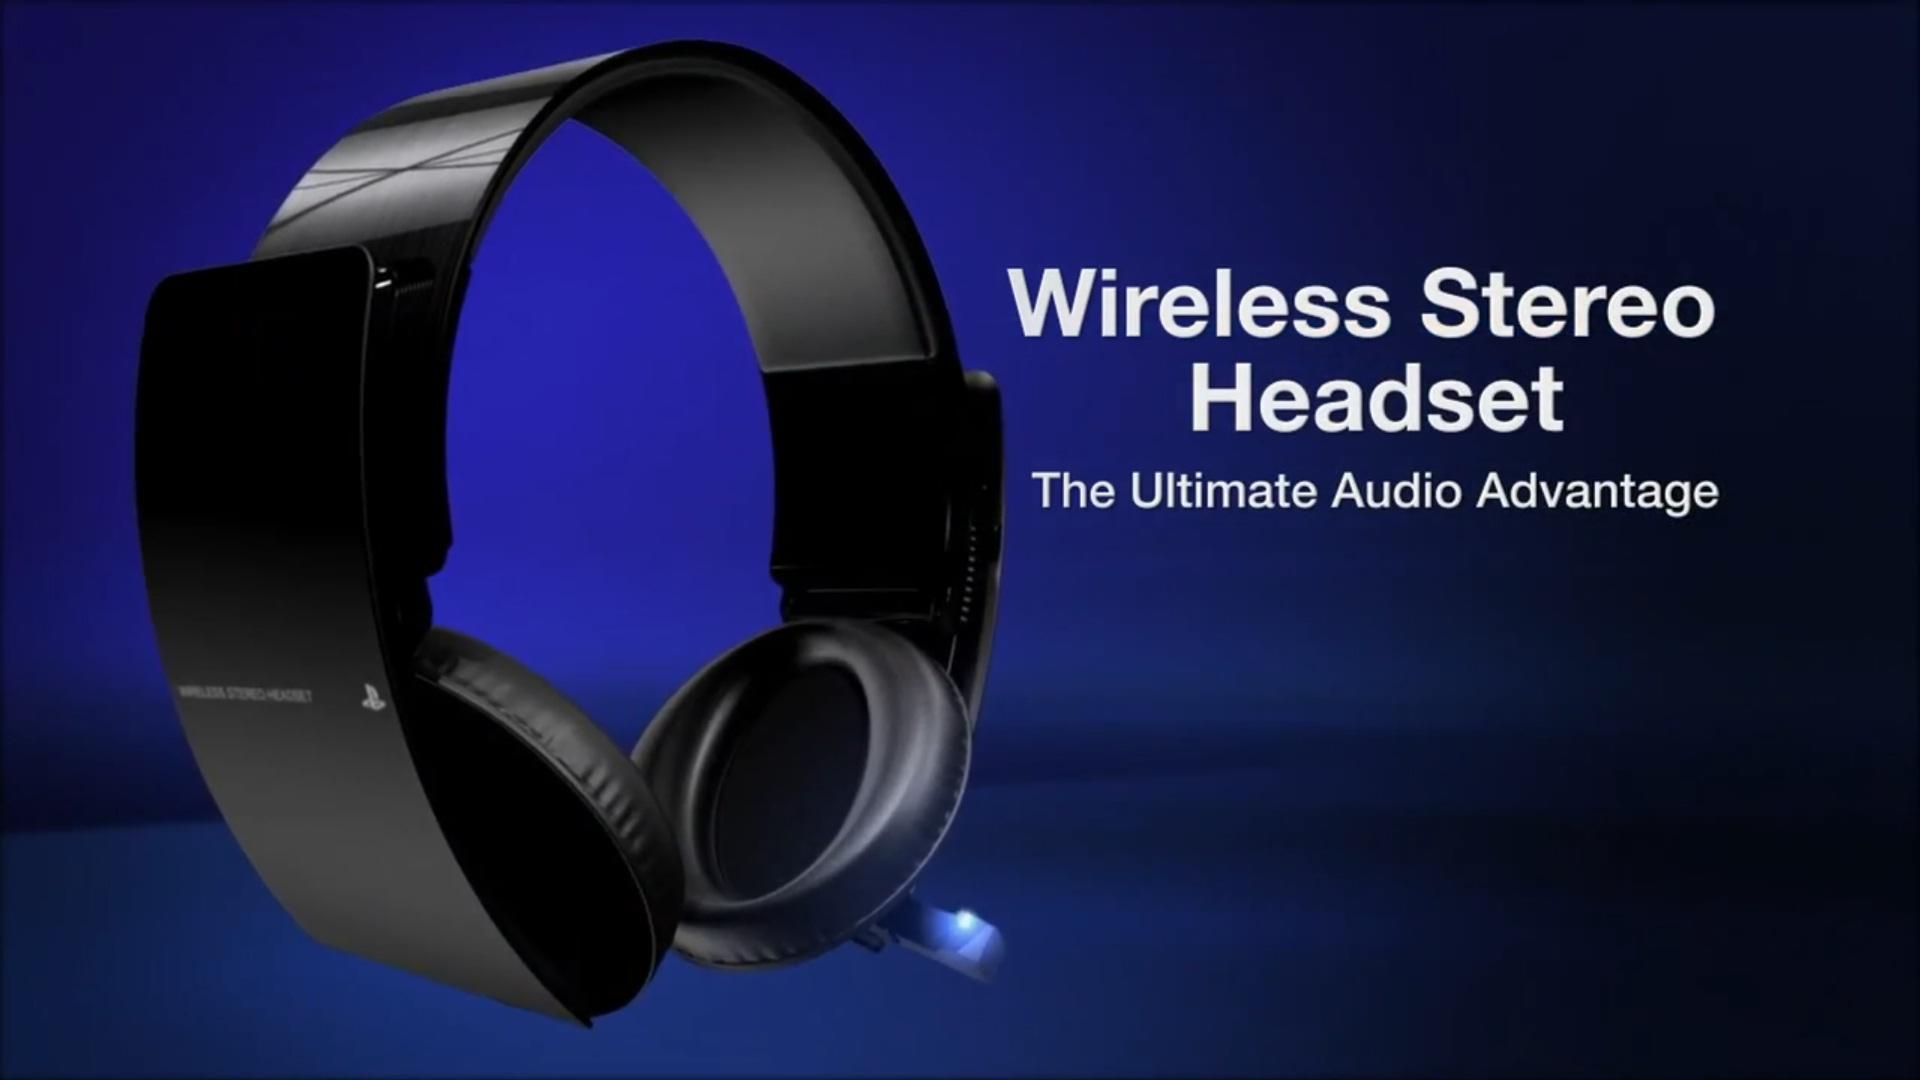 aud u00edfonos pulse ps3 wireless stereo headset 7 1 play3 pc